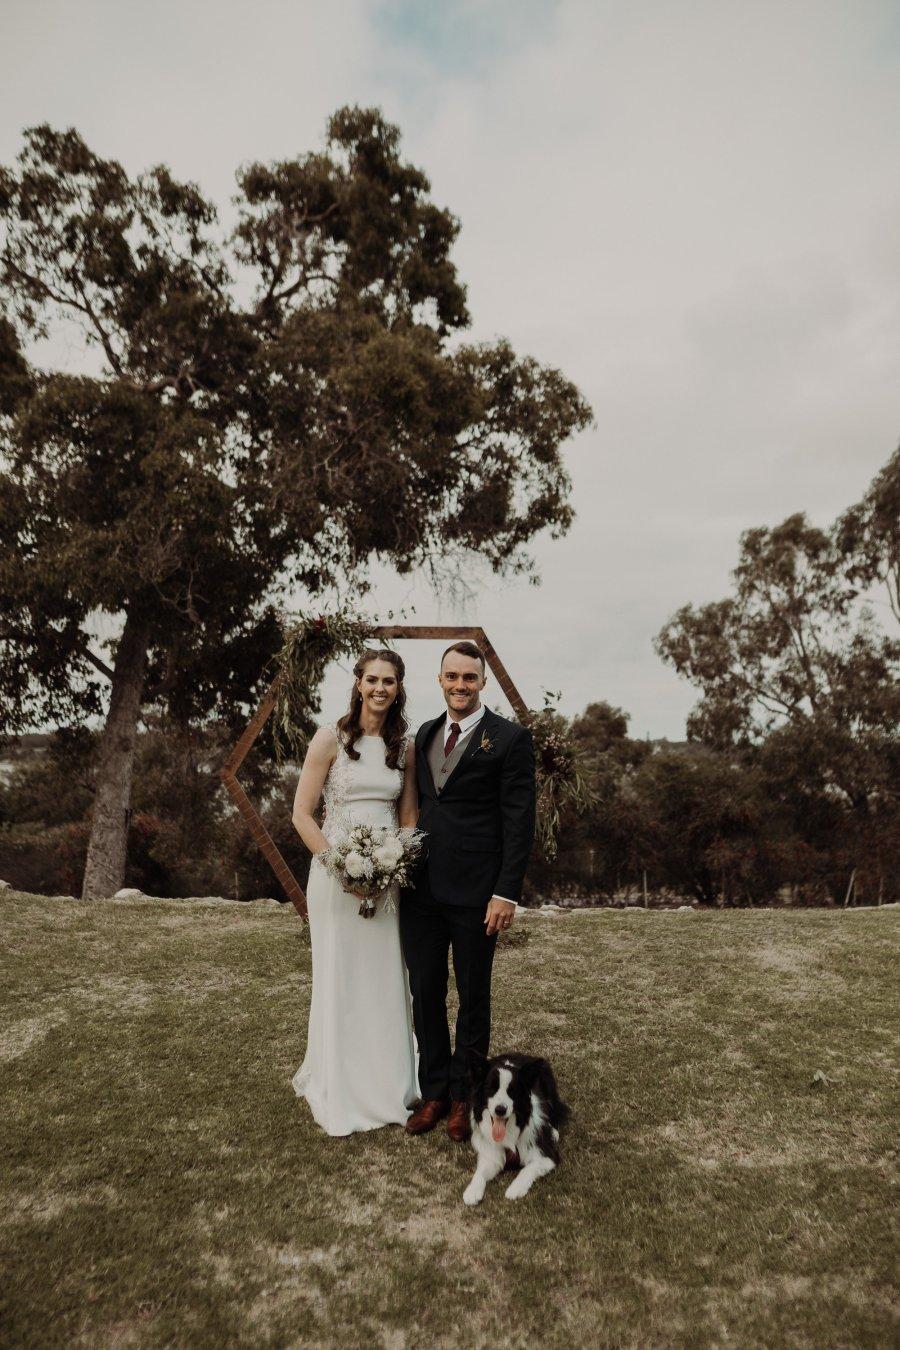 Pip + Mitch | Ebony Blush Photography | Perth Wedding Photographer | Perth Wedding Photos | Street Food Wedding | Fremantle Wedding Photos41